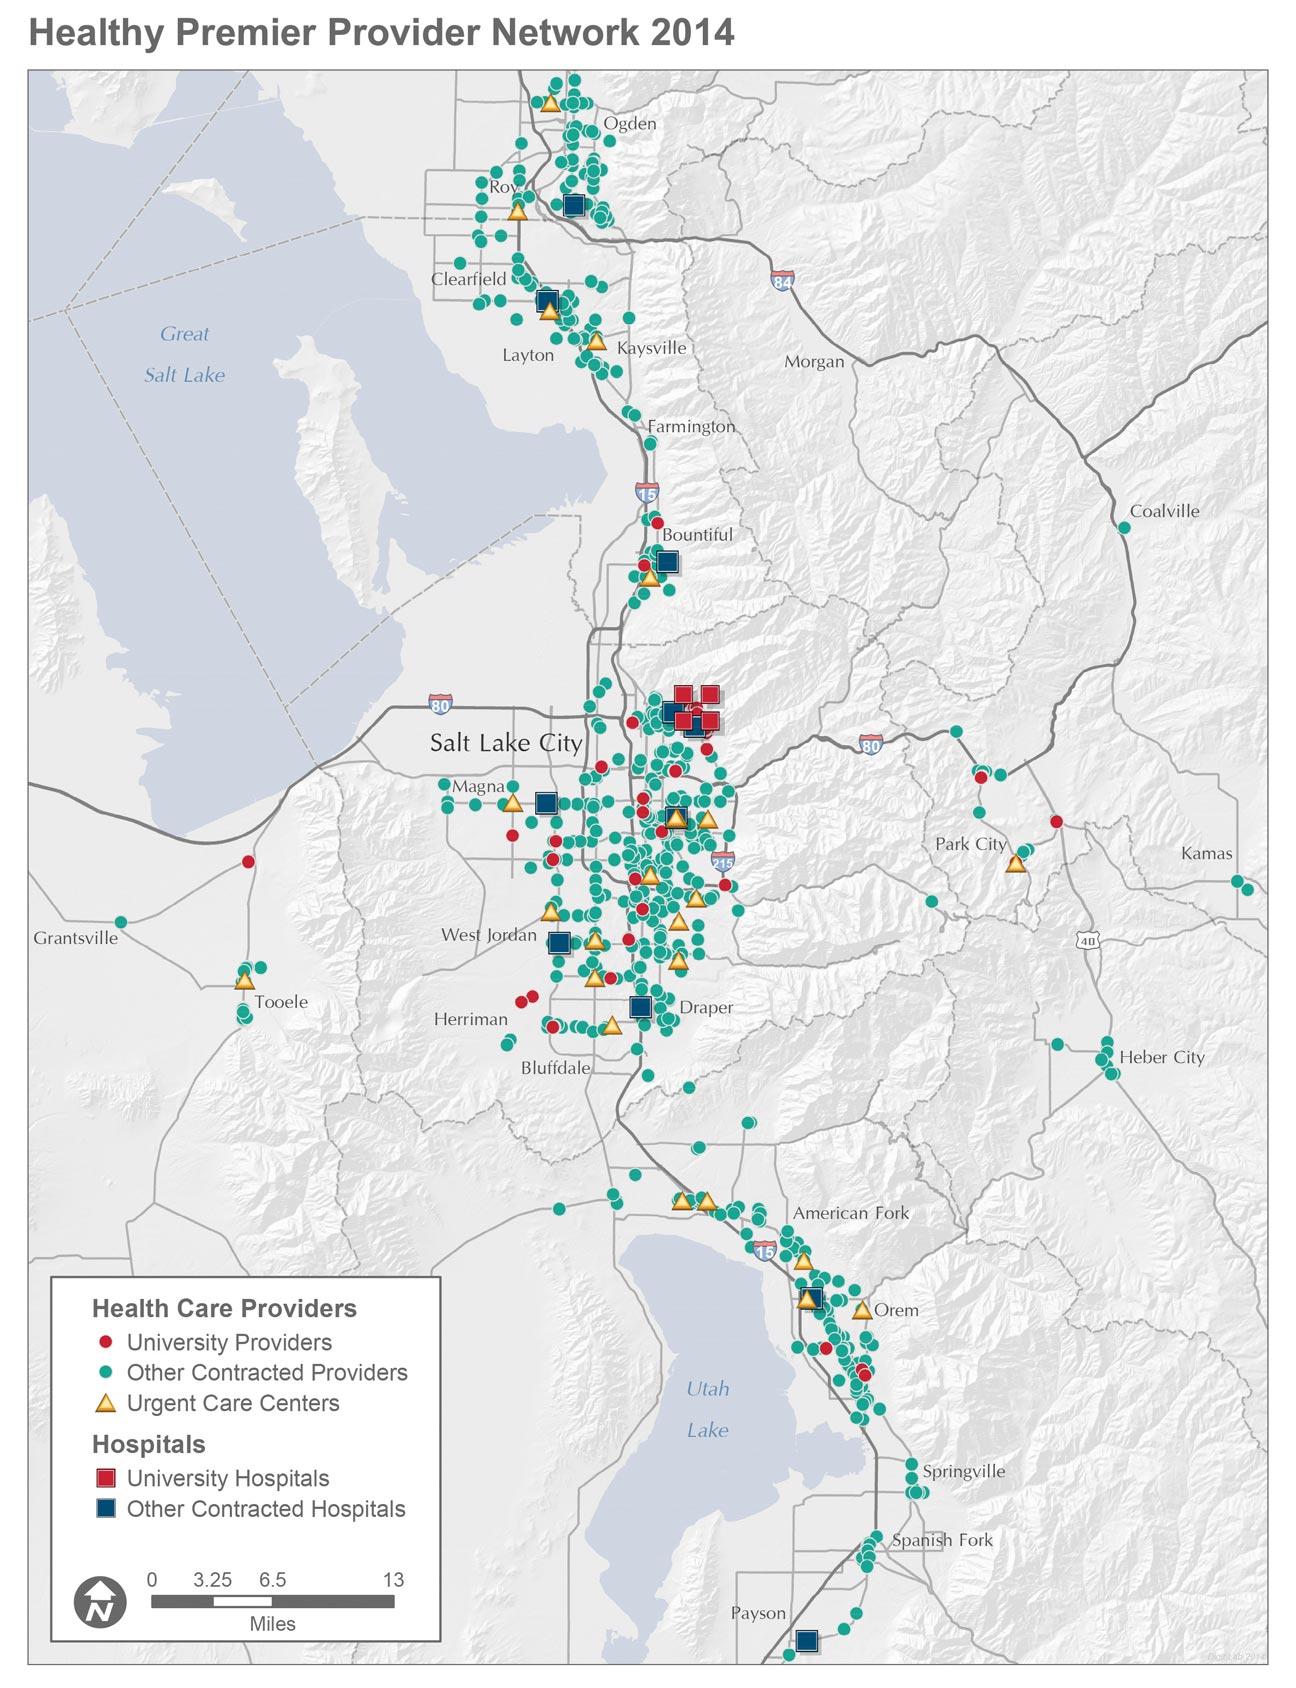 Va Hospital Utah Map.University Health Plans